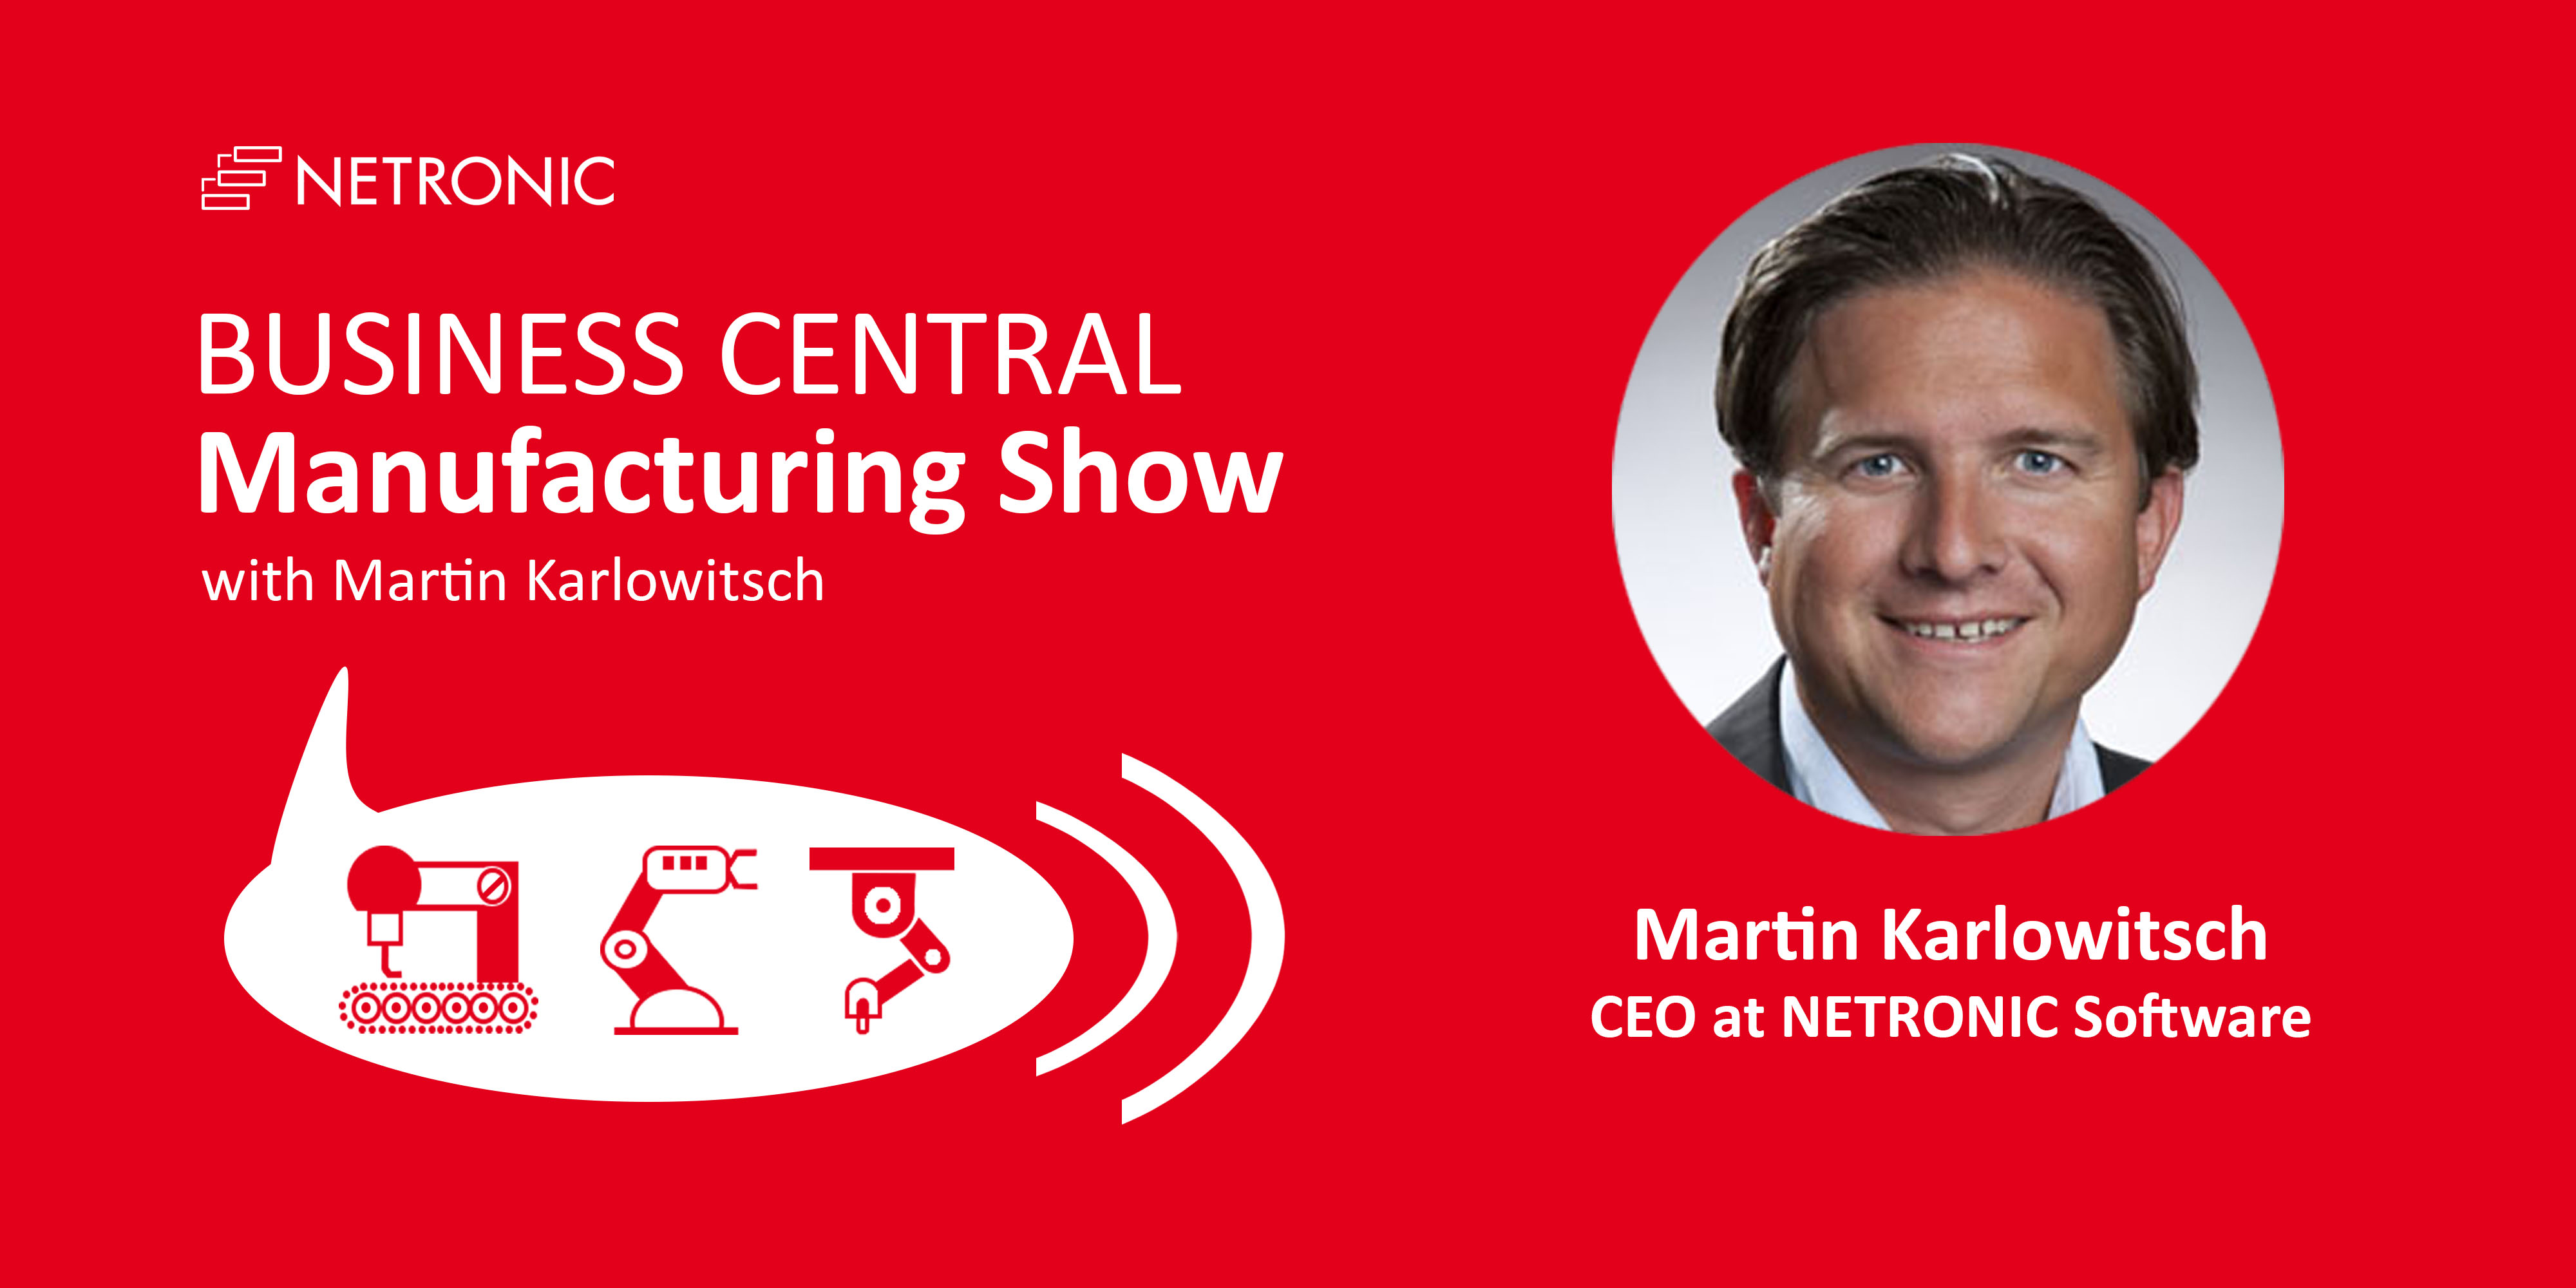 Business Central Manufacturing Show - Episode 00 - Martin Karlowitsch